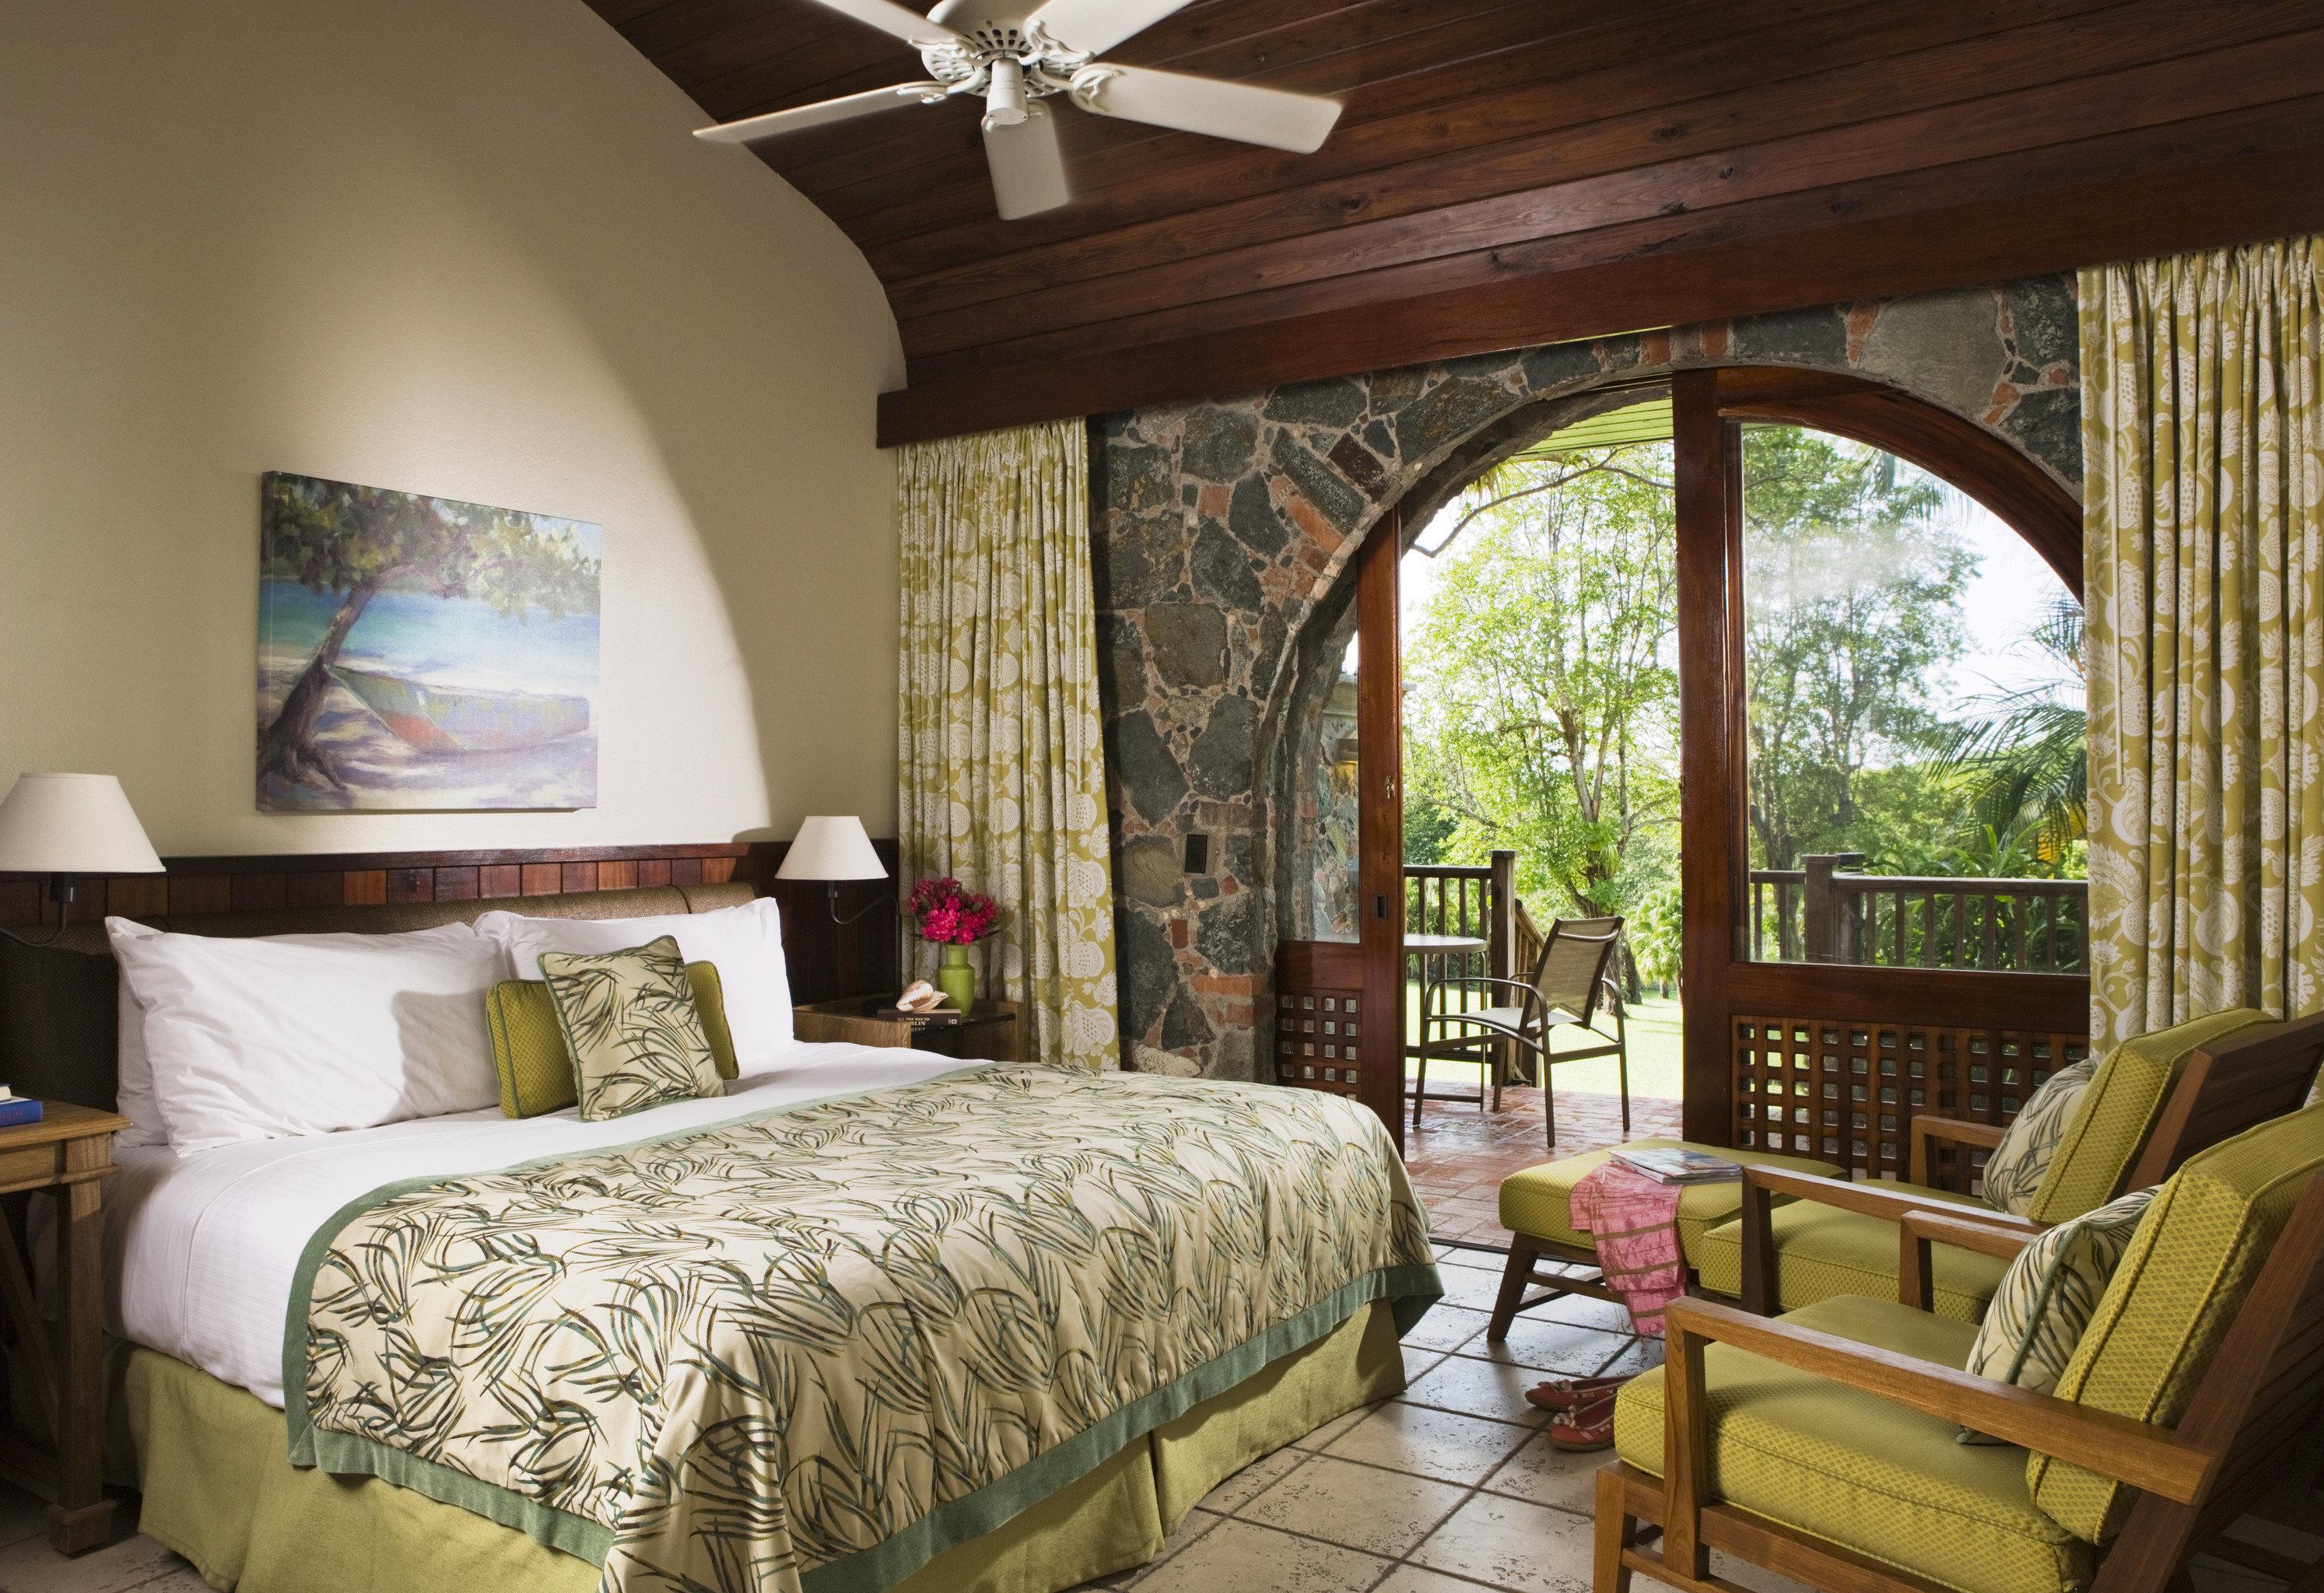 Tropical Bedroom | Tropical bedroom decor, Tropical ...